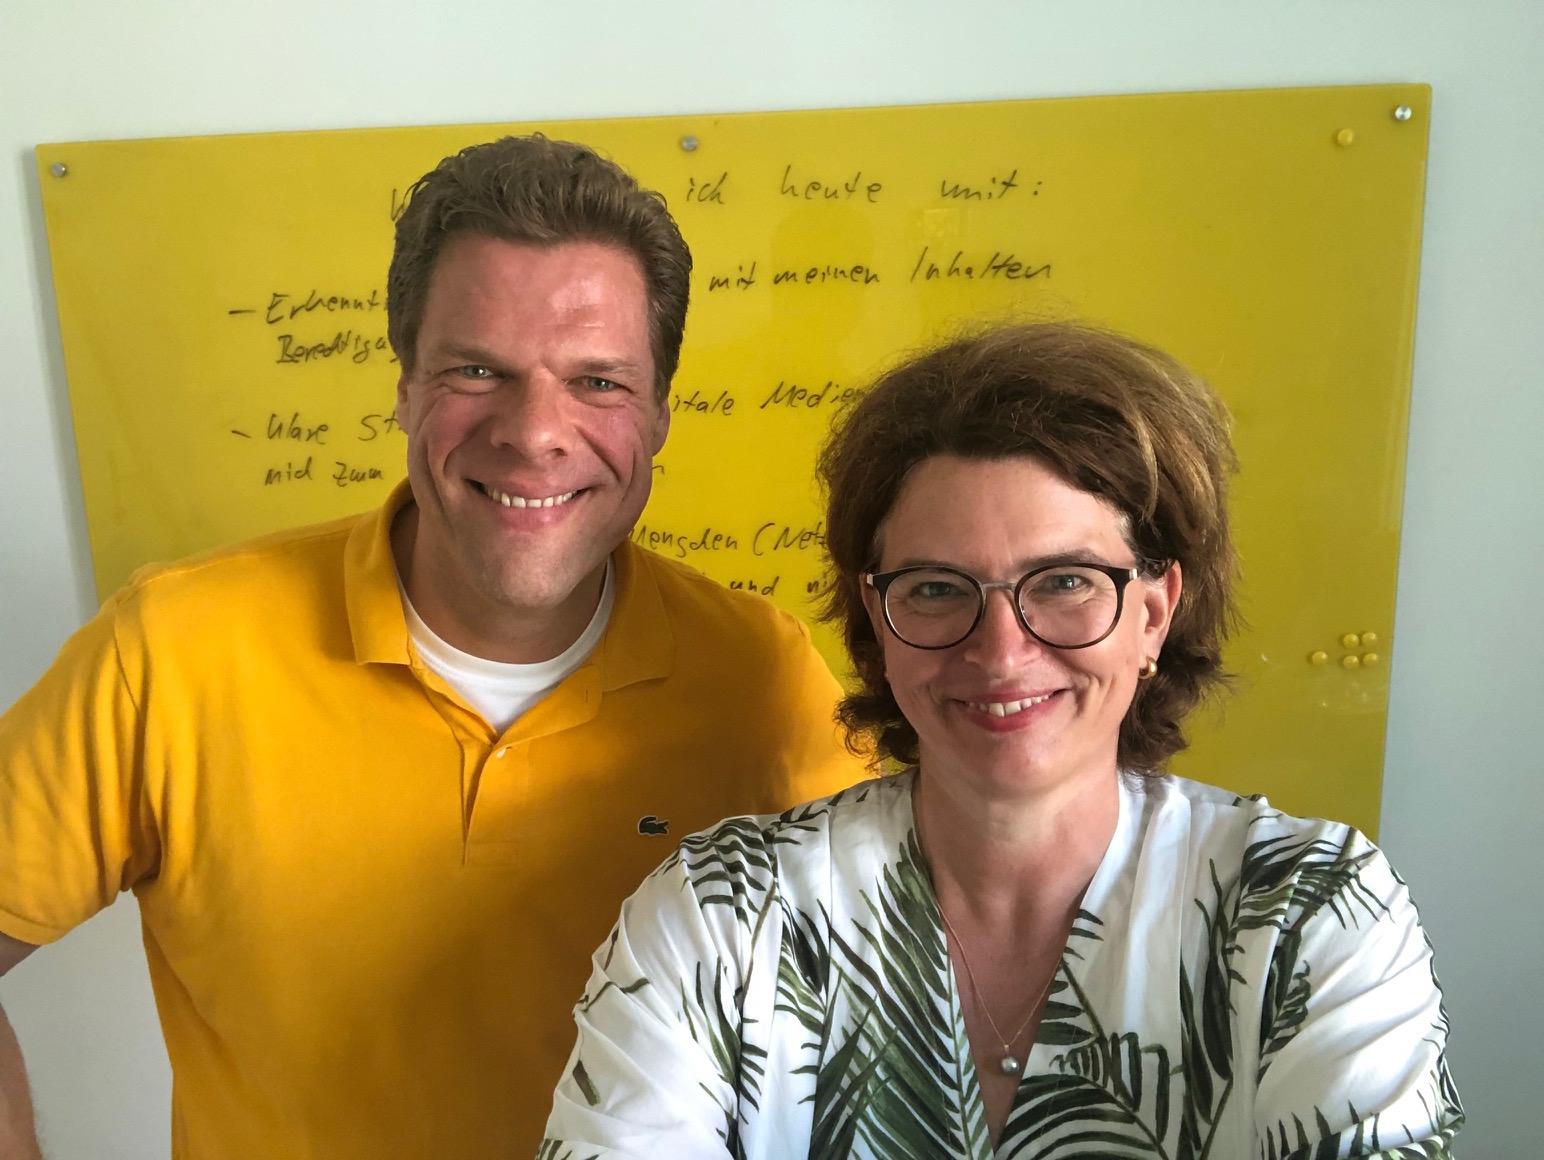 Digital Coaching, LinkedIn Workshop, Experten Branding, Persona Branding